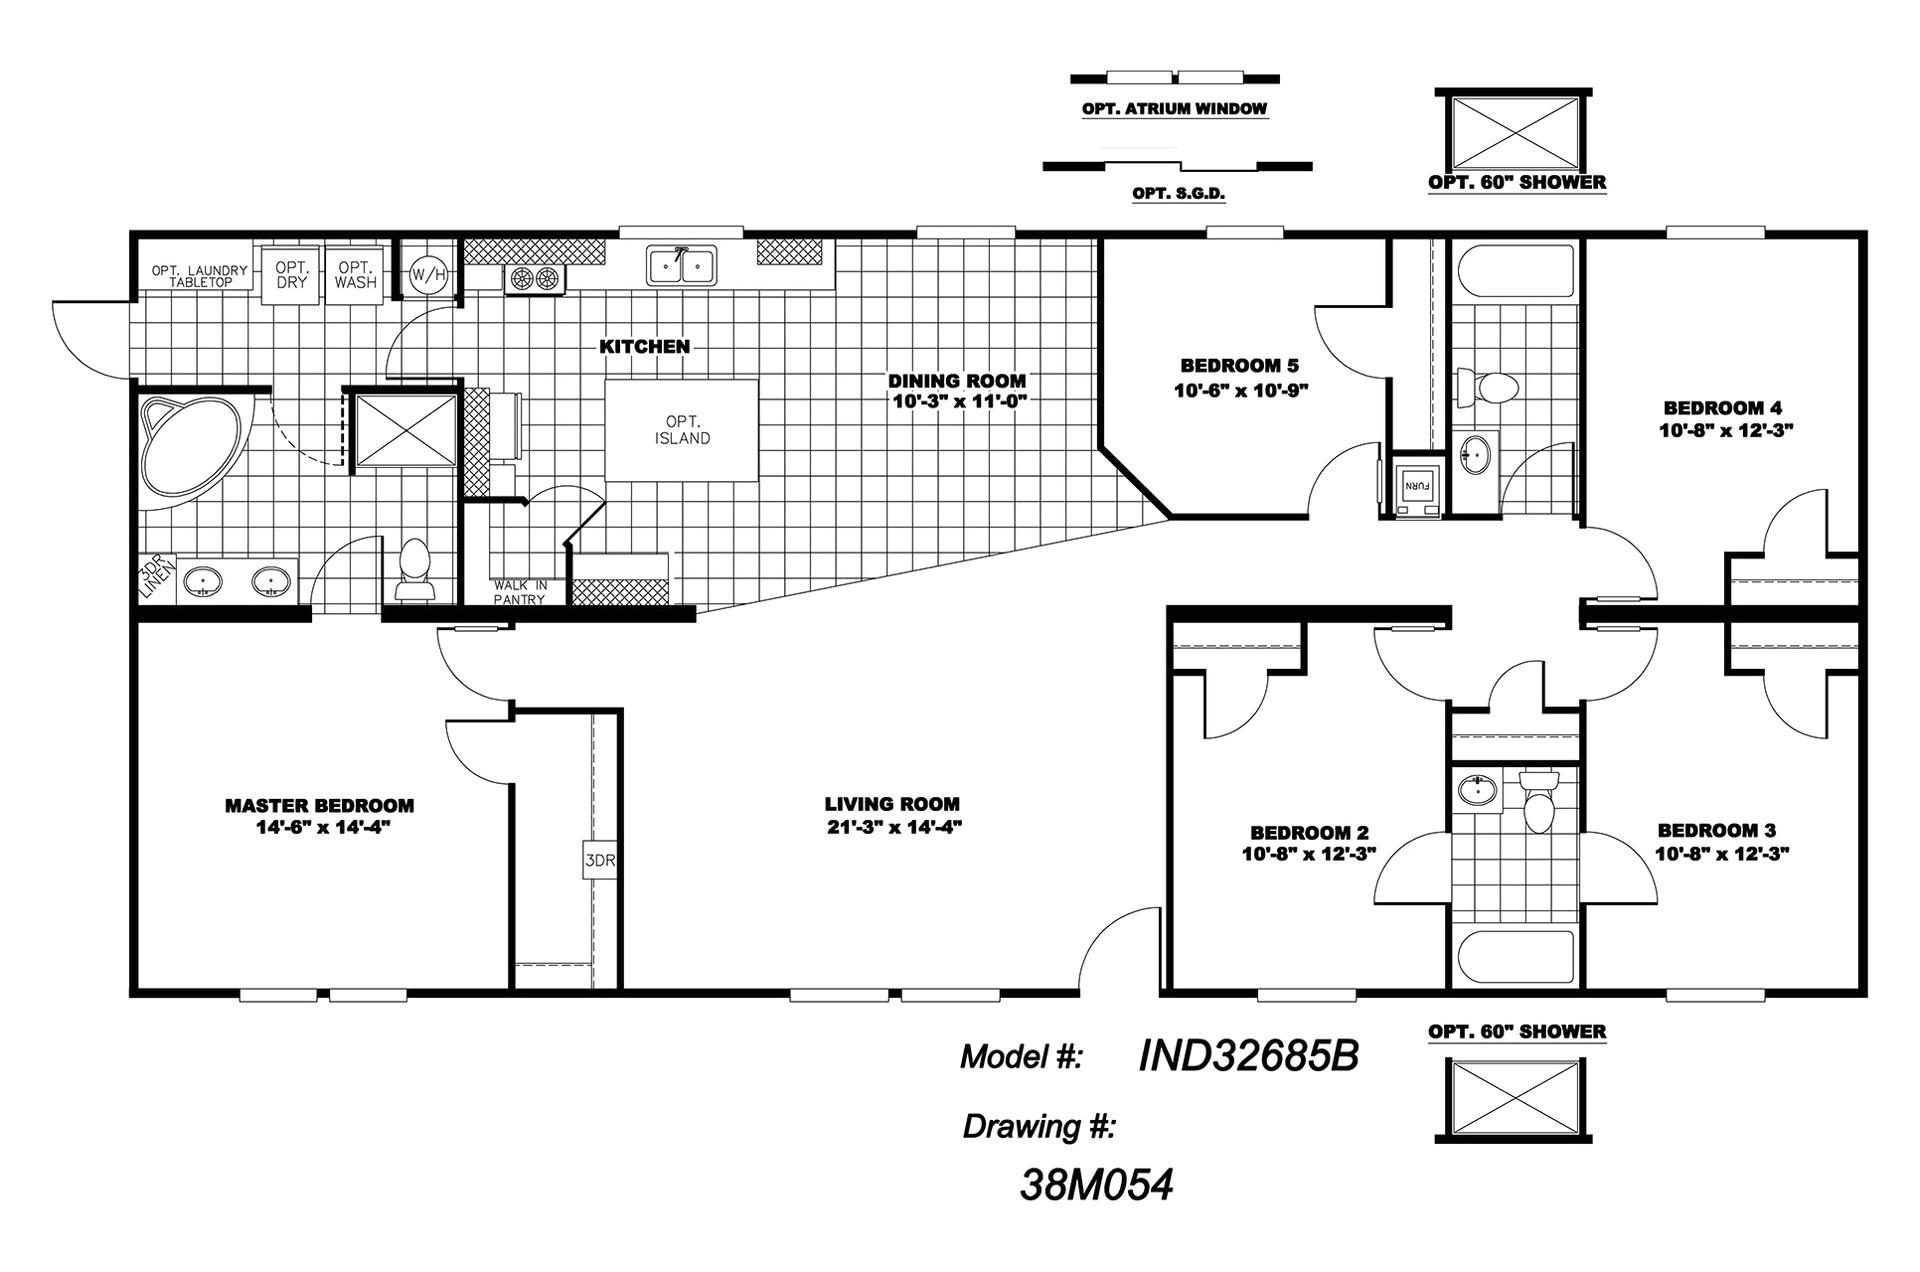 manufacturedhomefloorplan floorplan 5288 state ok city fay